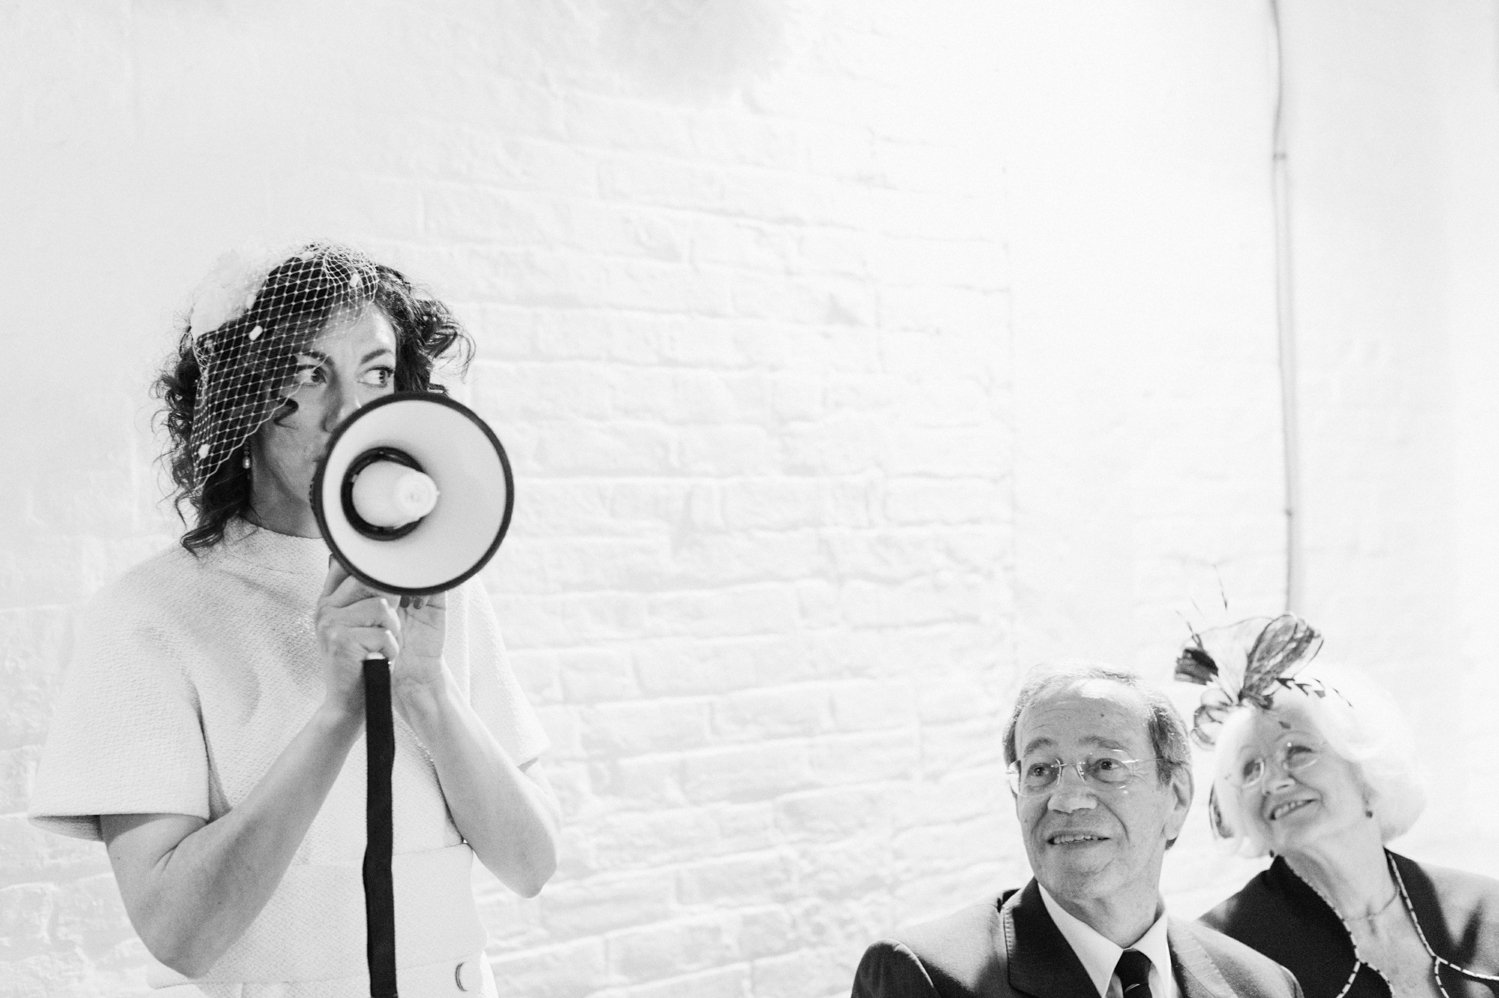 brixton east wedding photographer-33